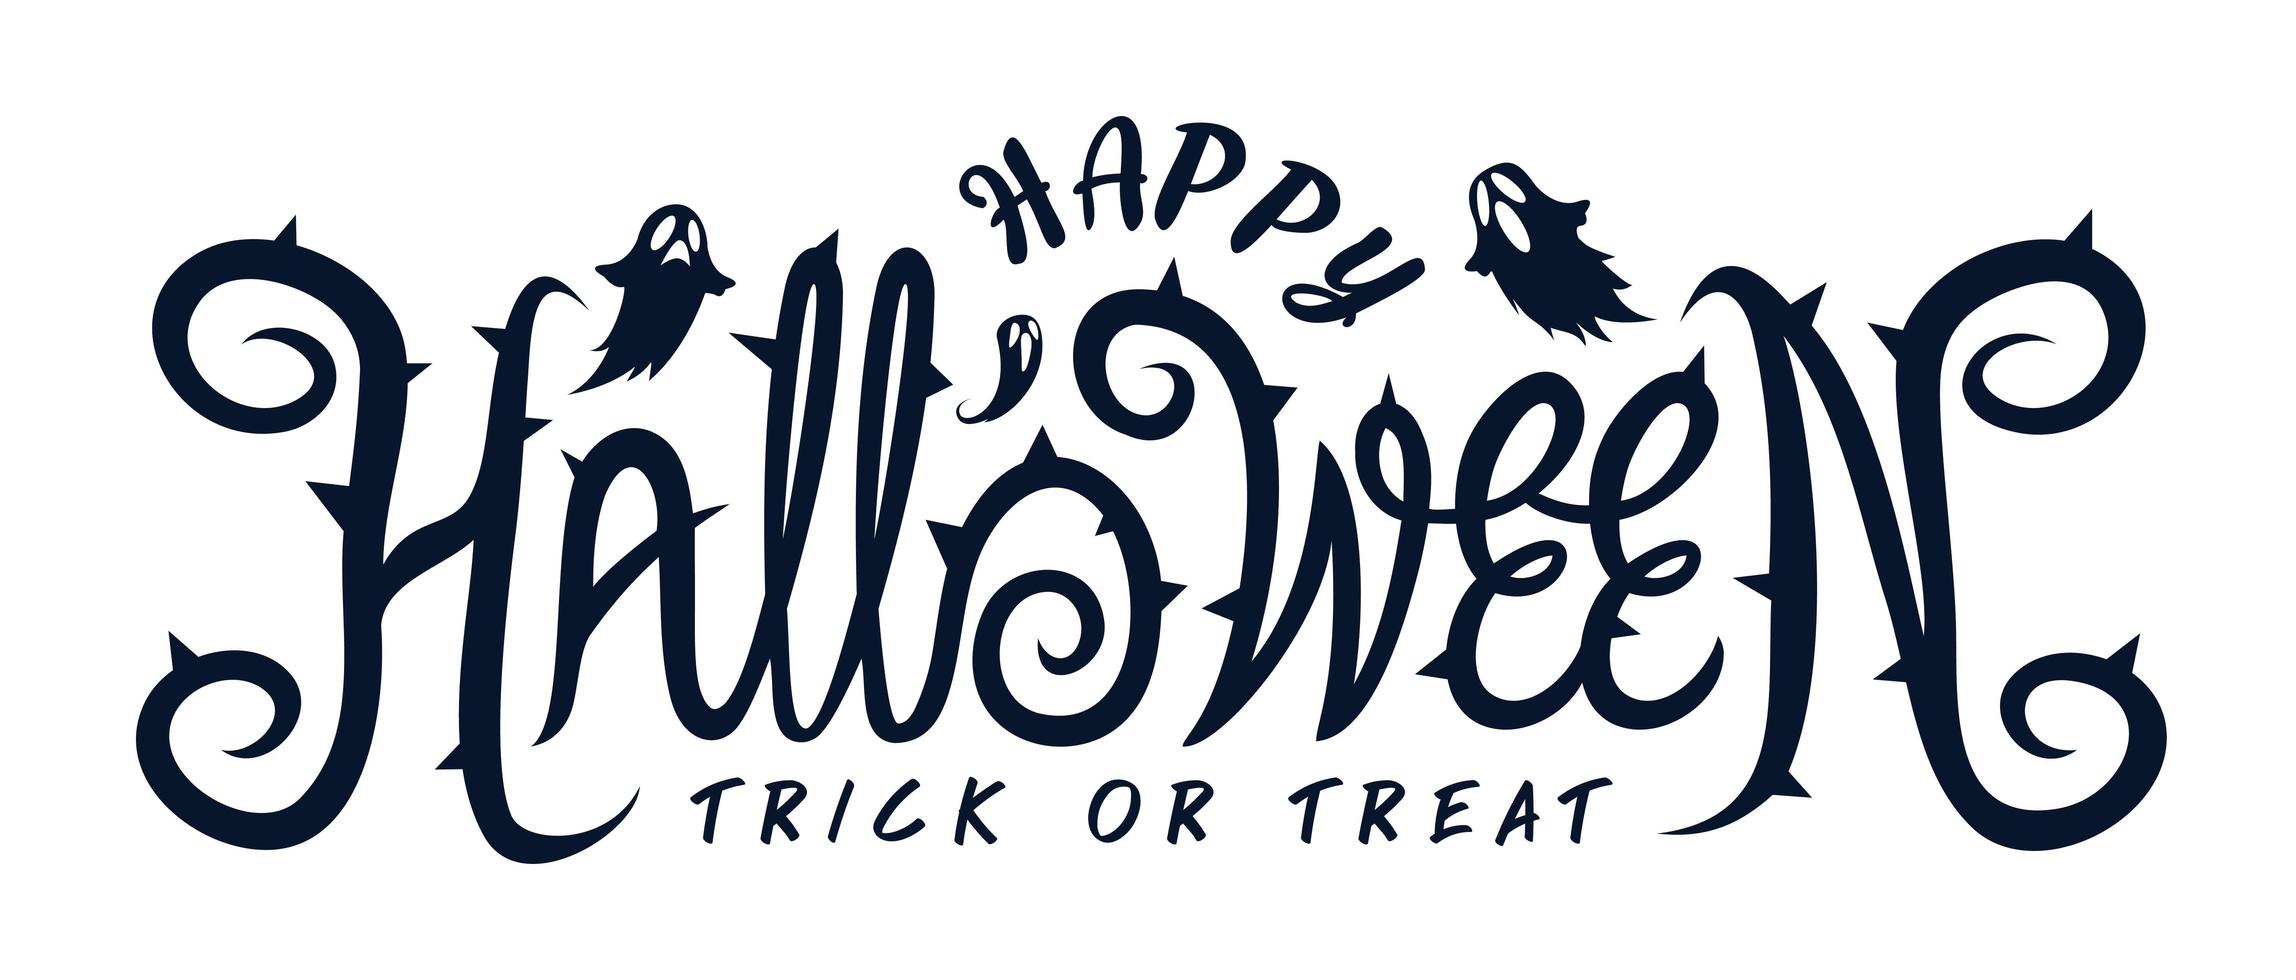 feliz texto de fiesta de halloween con fantasma vector